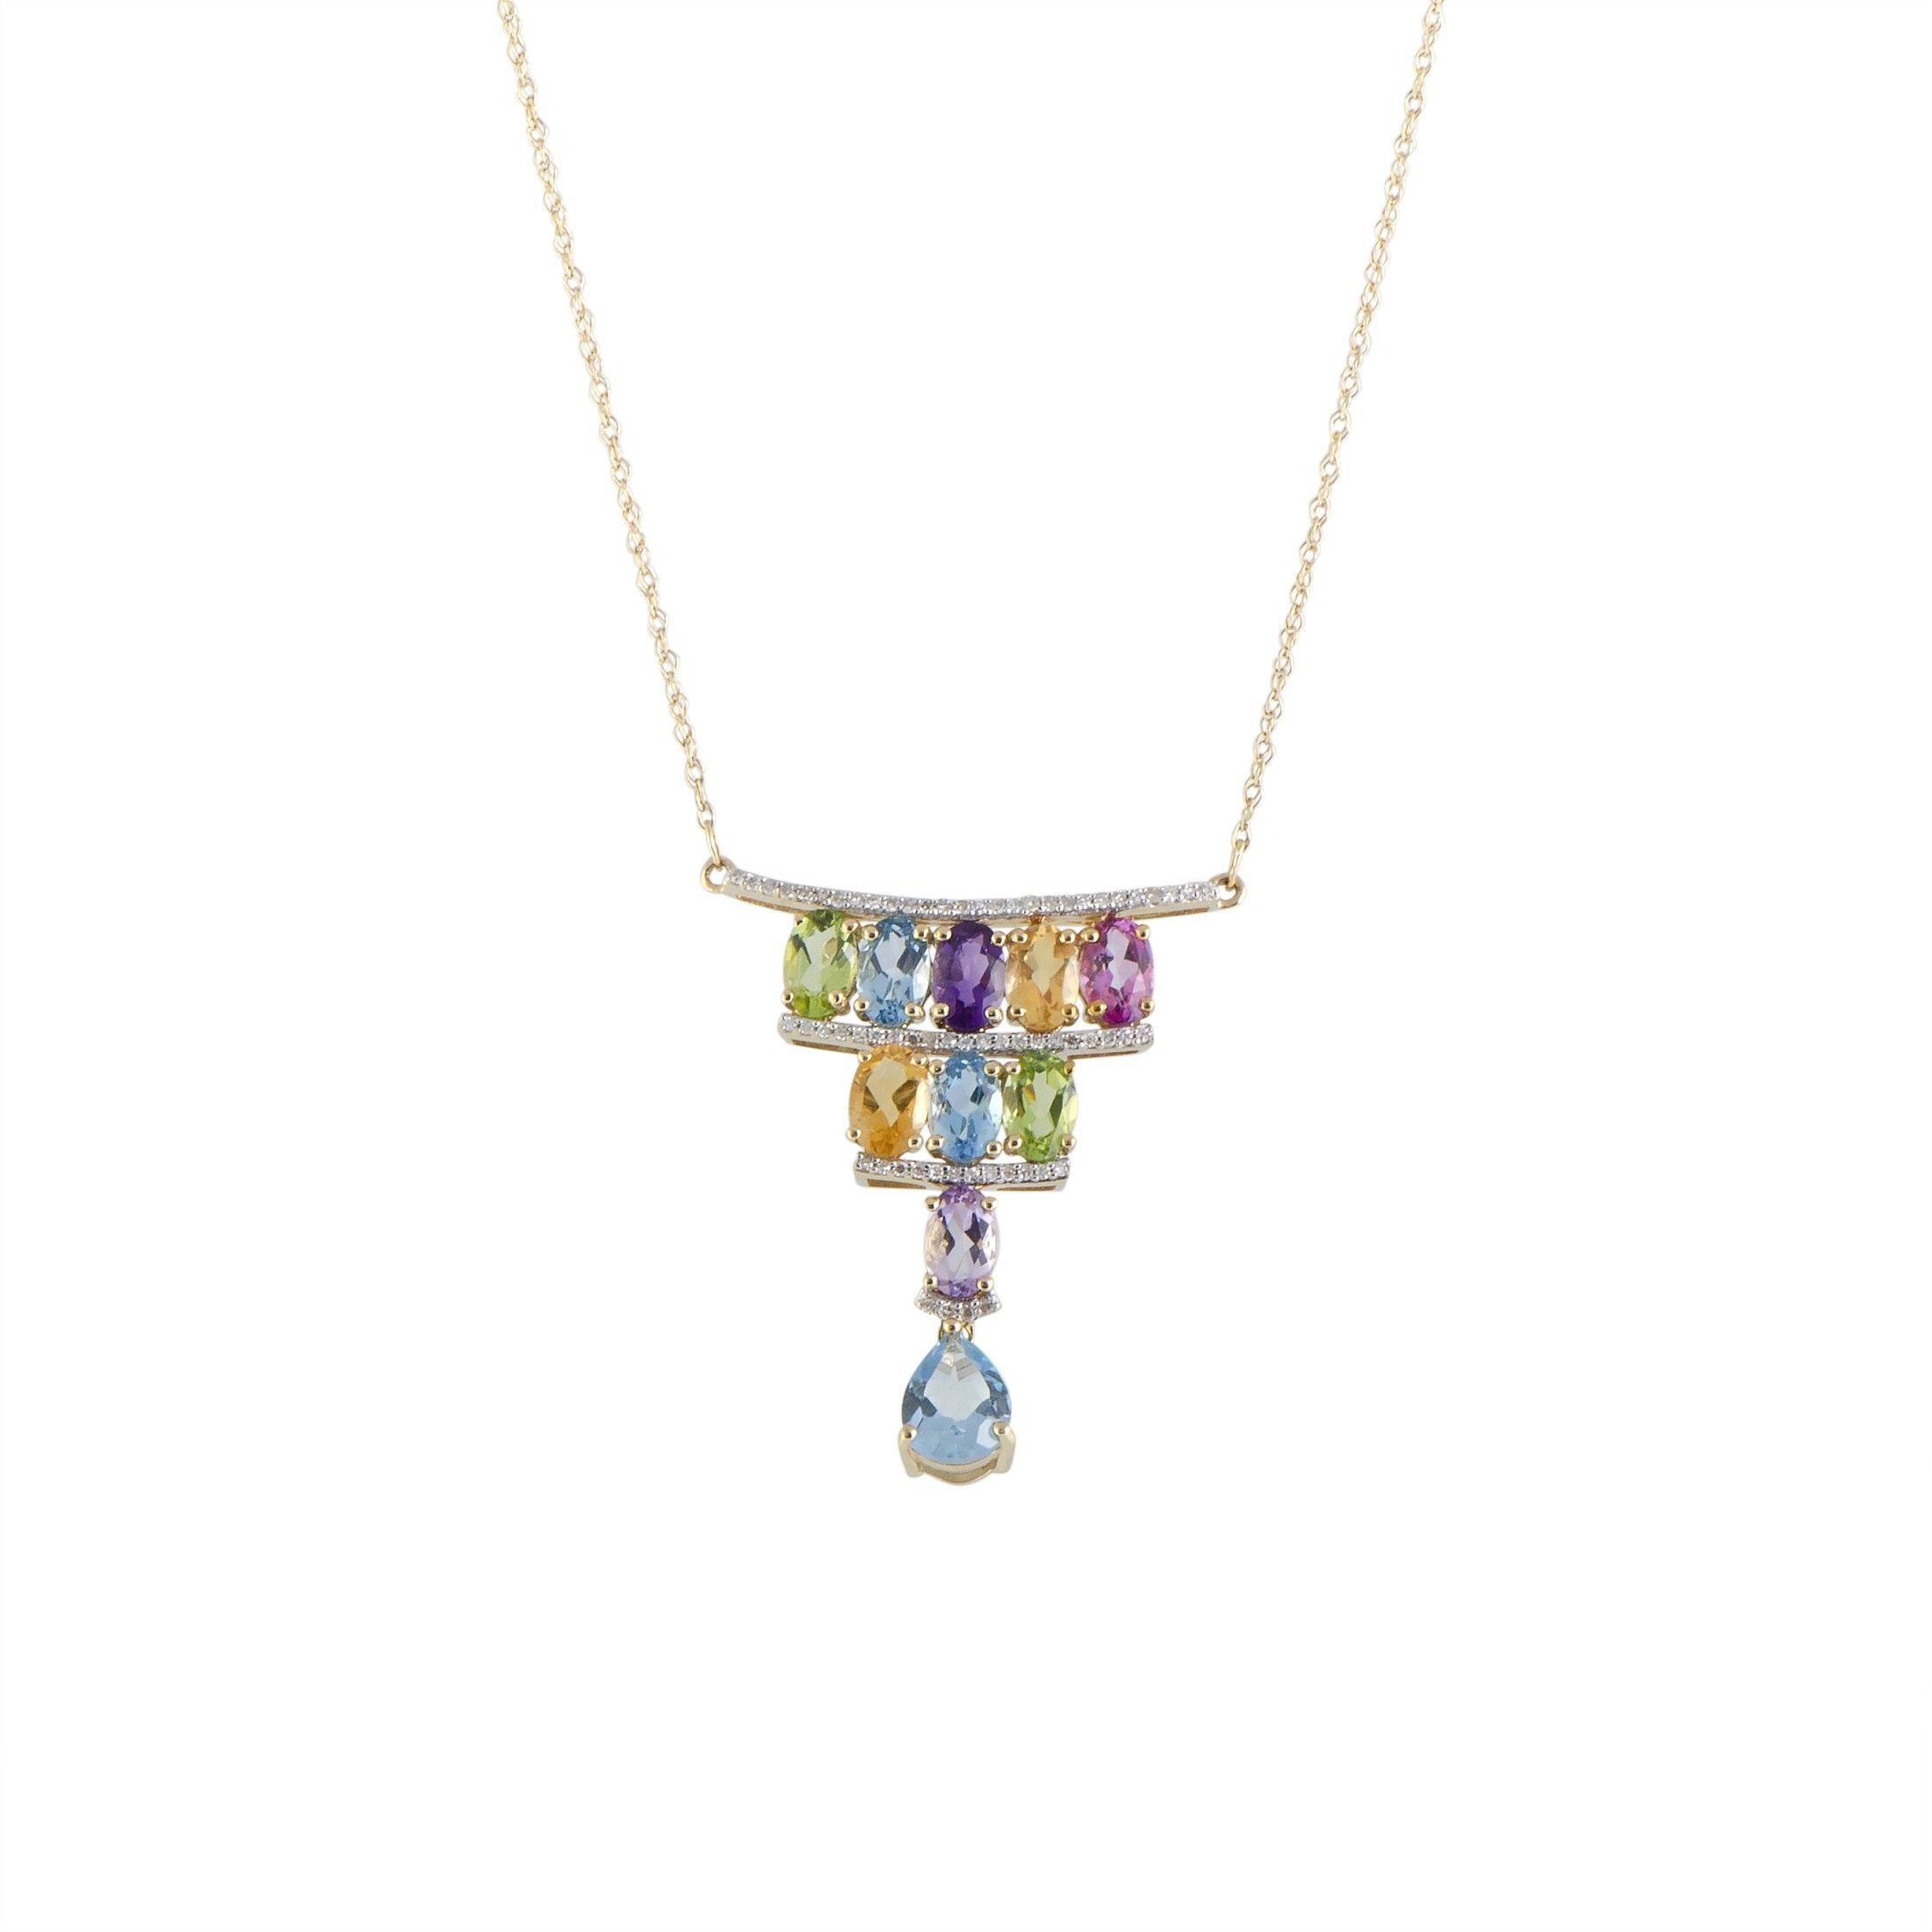 fca5f9ba1f30e 14K Yellow Gold Diamond and Multiple Gemstones Triangle Pendant Necklace